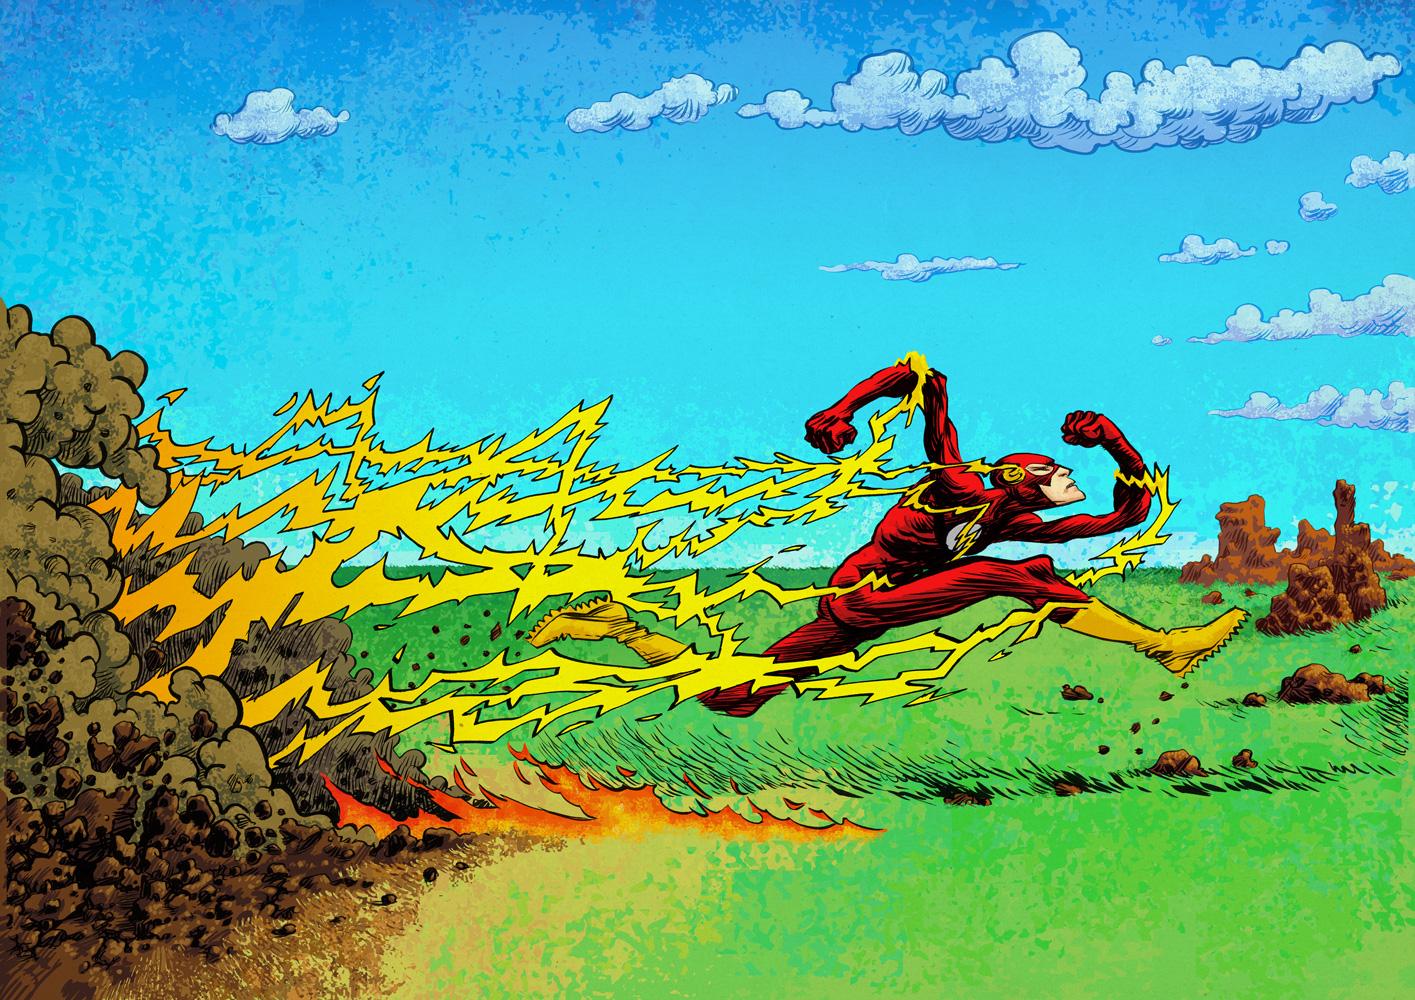 49+ Animated Flashing Wallpaper on WallpaperSafari